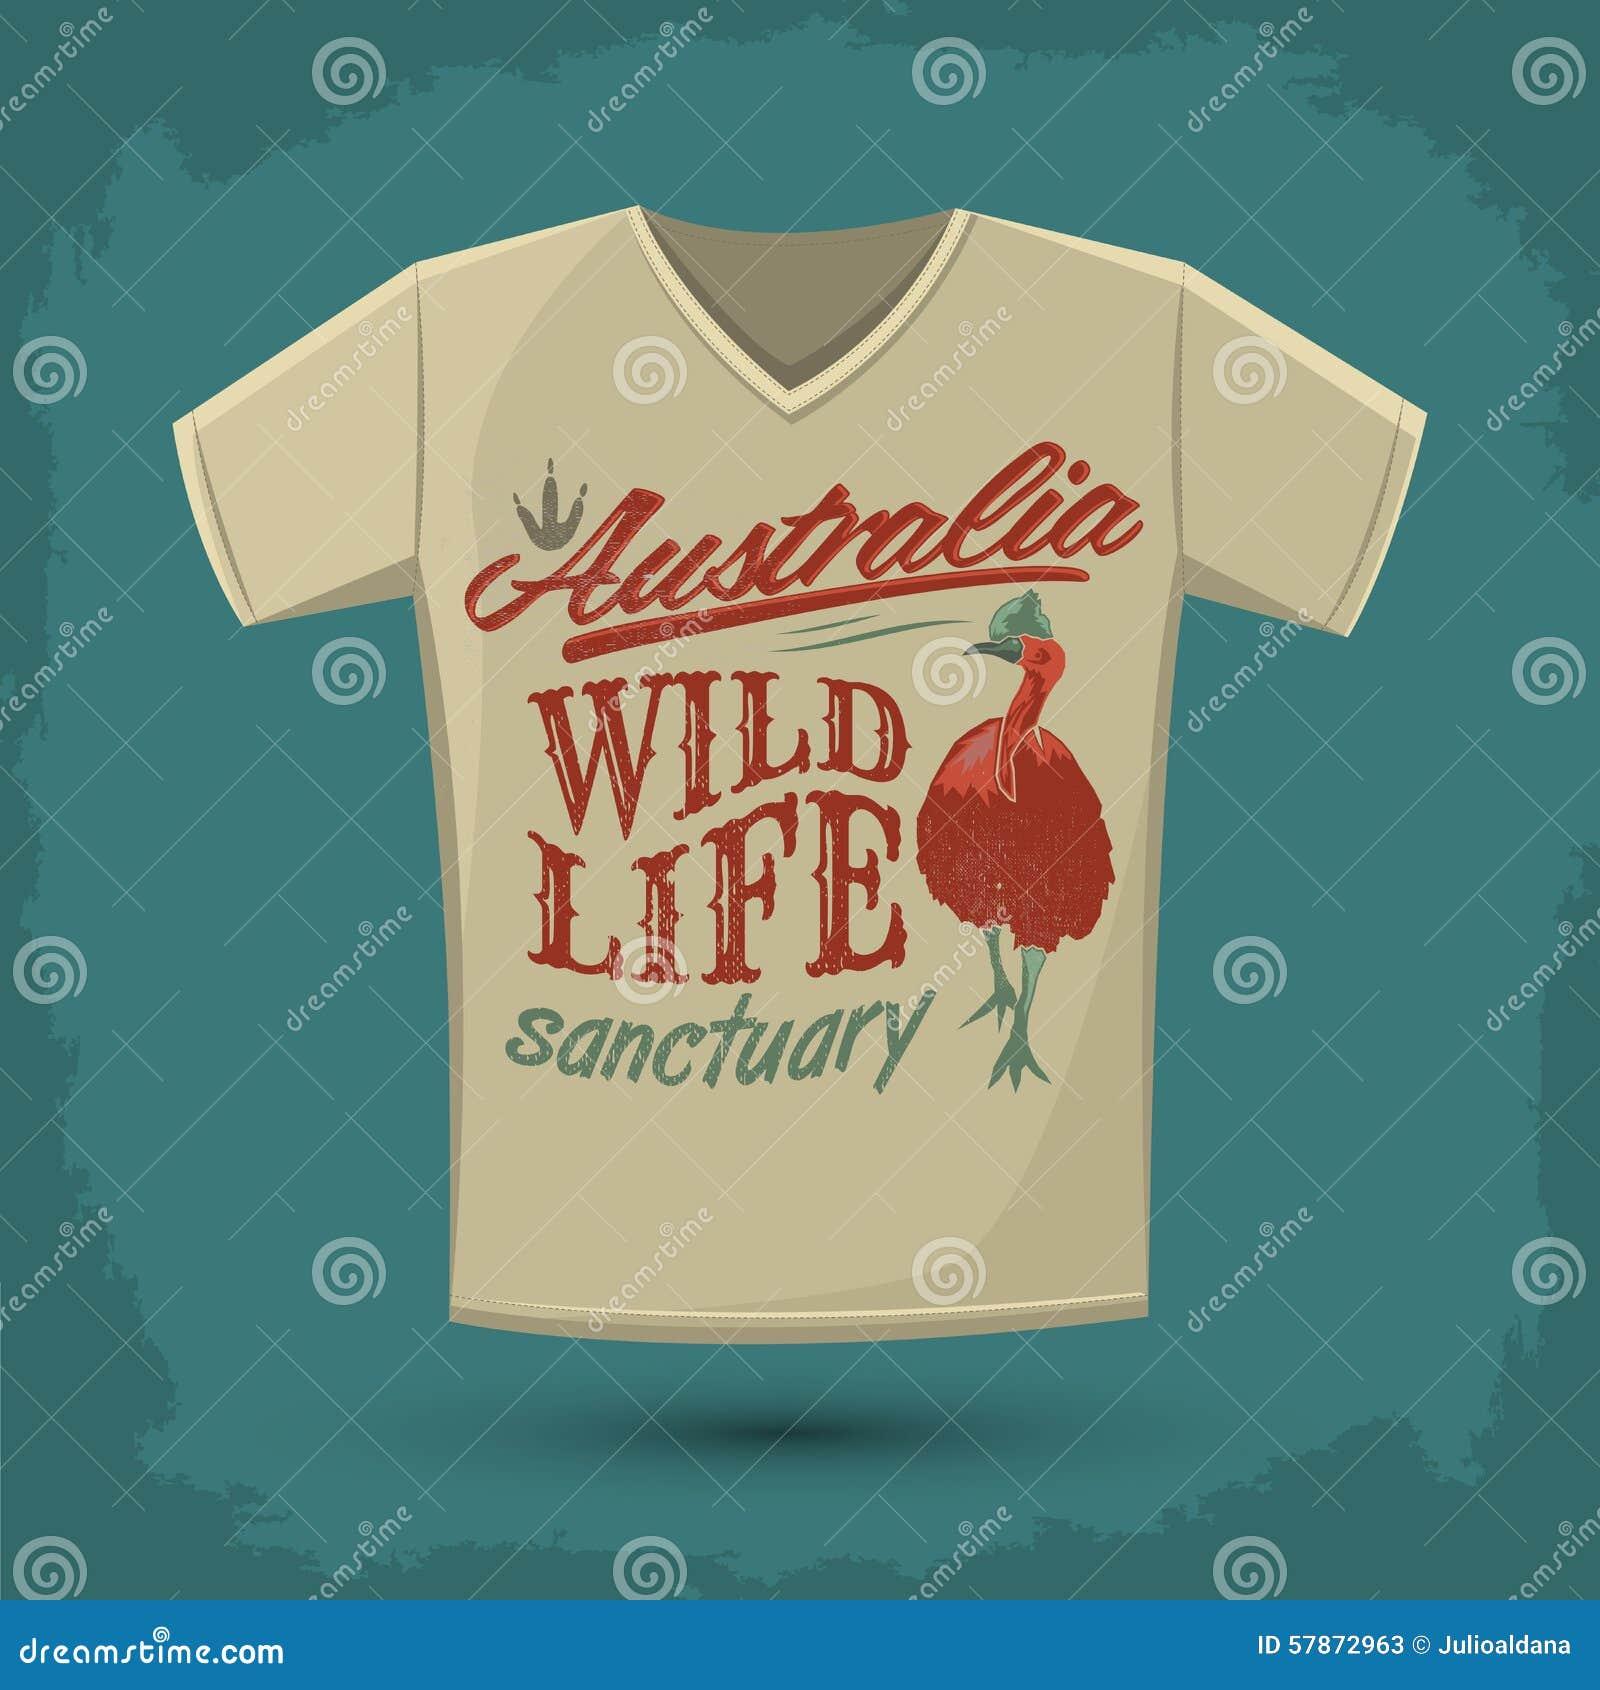 Graphic t shirt design australian wild life sanctuary Design t shirt australia